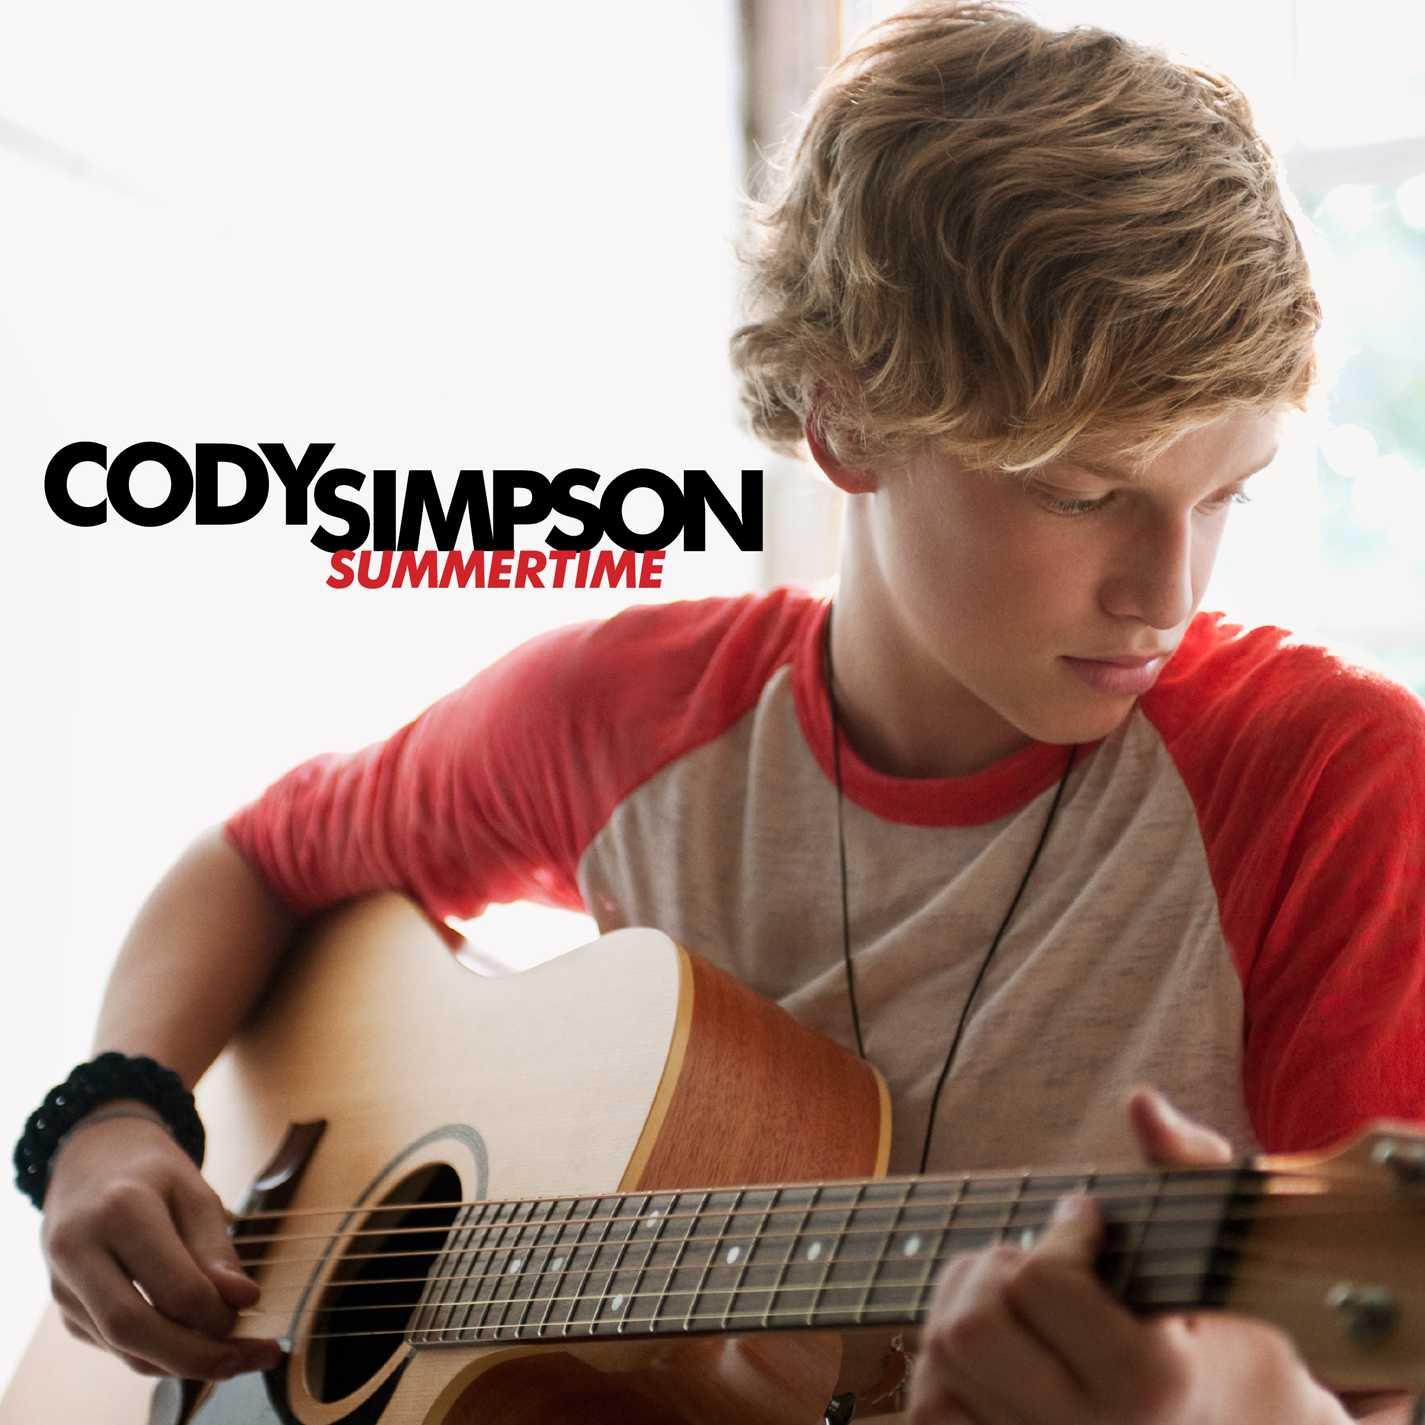 http://2.bp.blogspot.com/-V25Lw0ZZ8U0/Tg7rLI4ml_I/AAAAAAAAAAo/gXWc5eizSGc/s1600/Cody+Simpson+-+Summertime.jpg